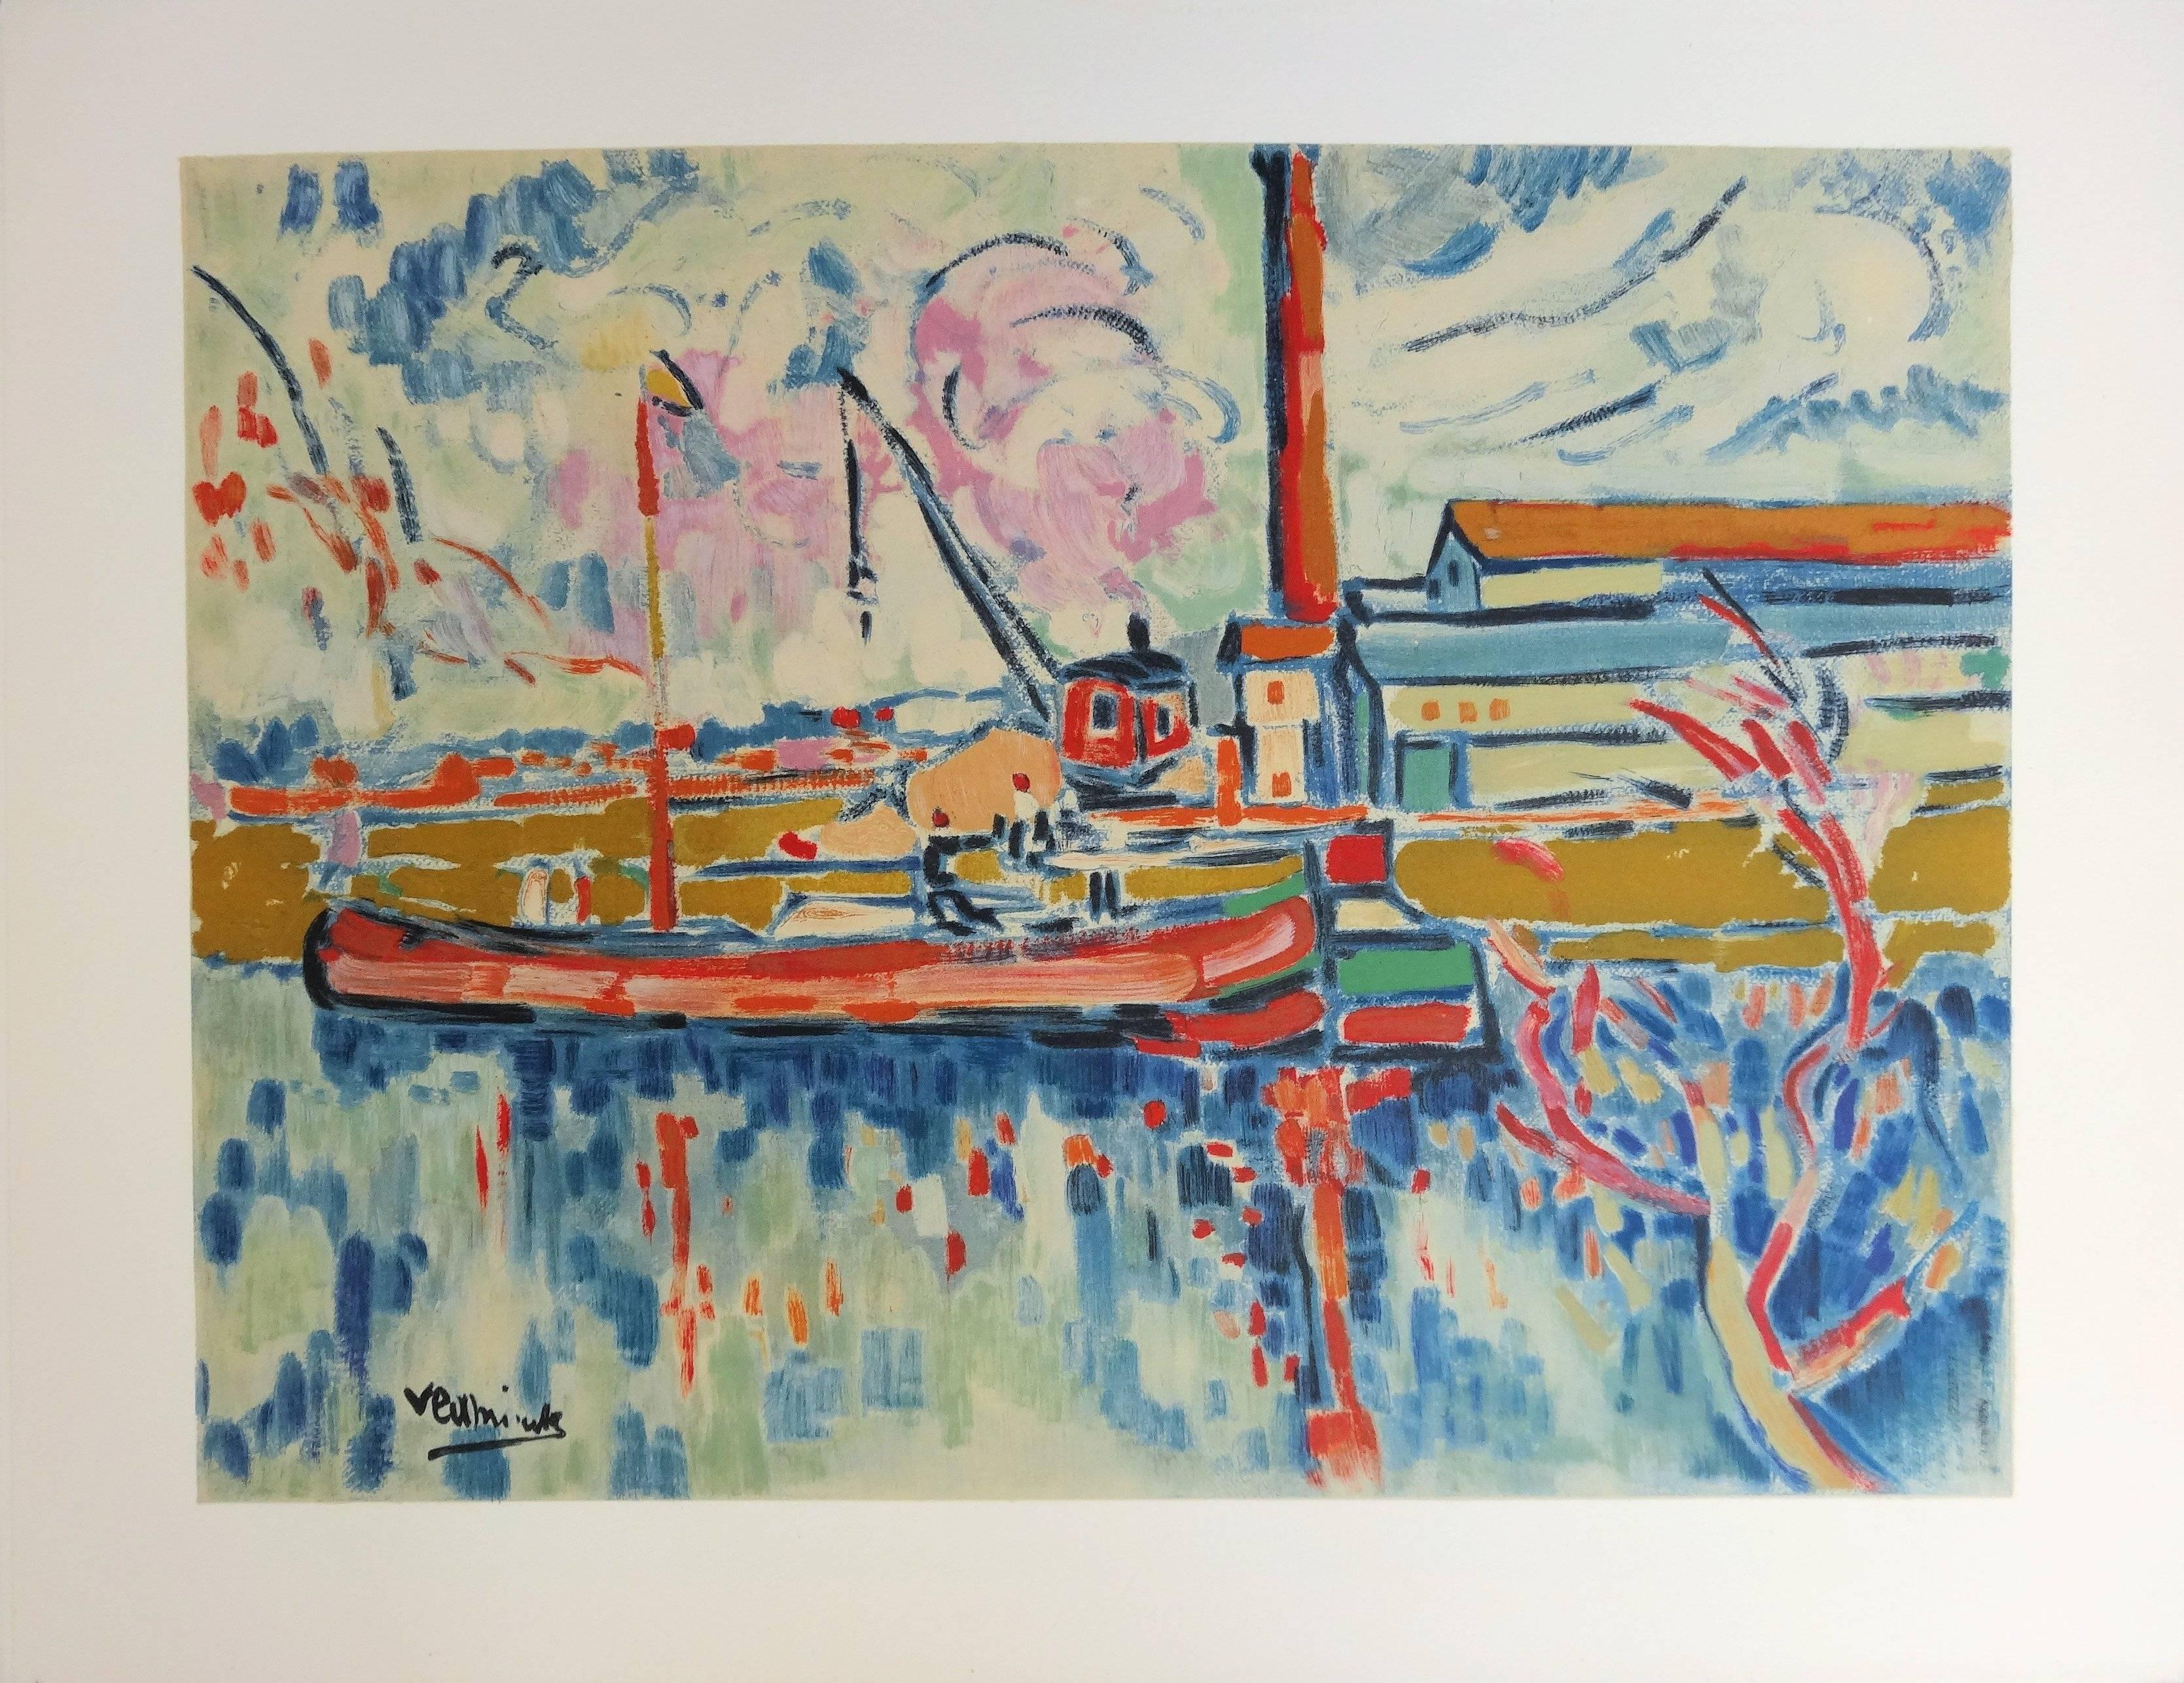 Seine River and Boat in Chatou - Lithograph, 1972